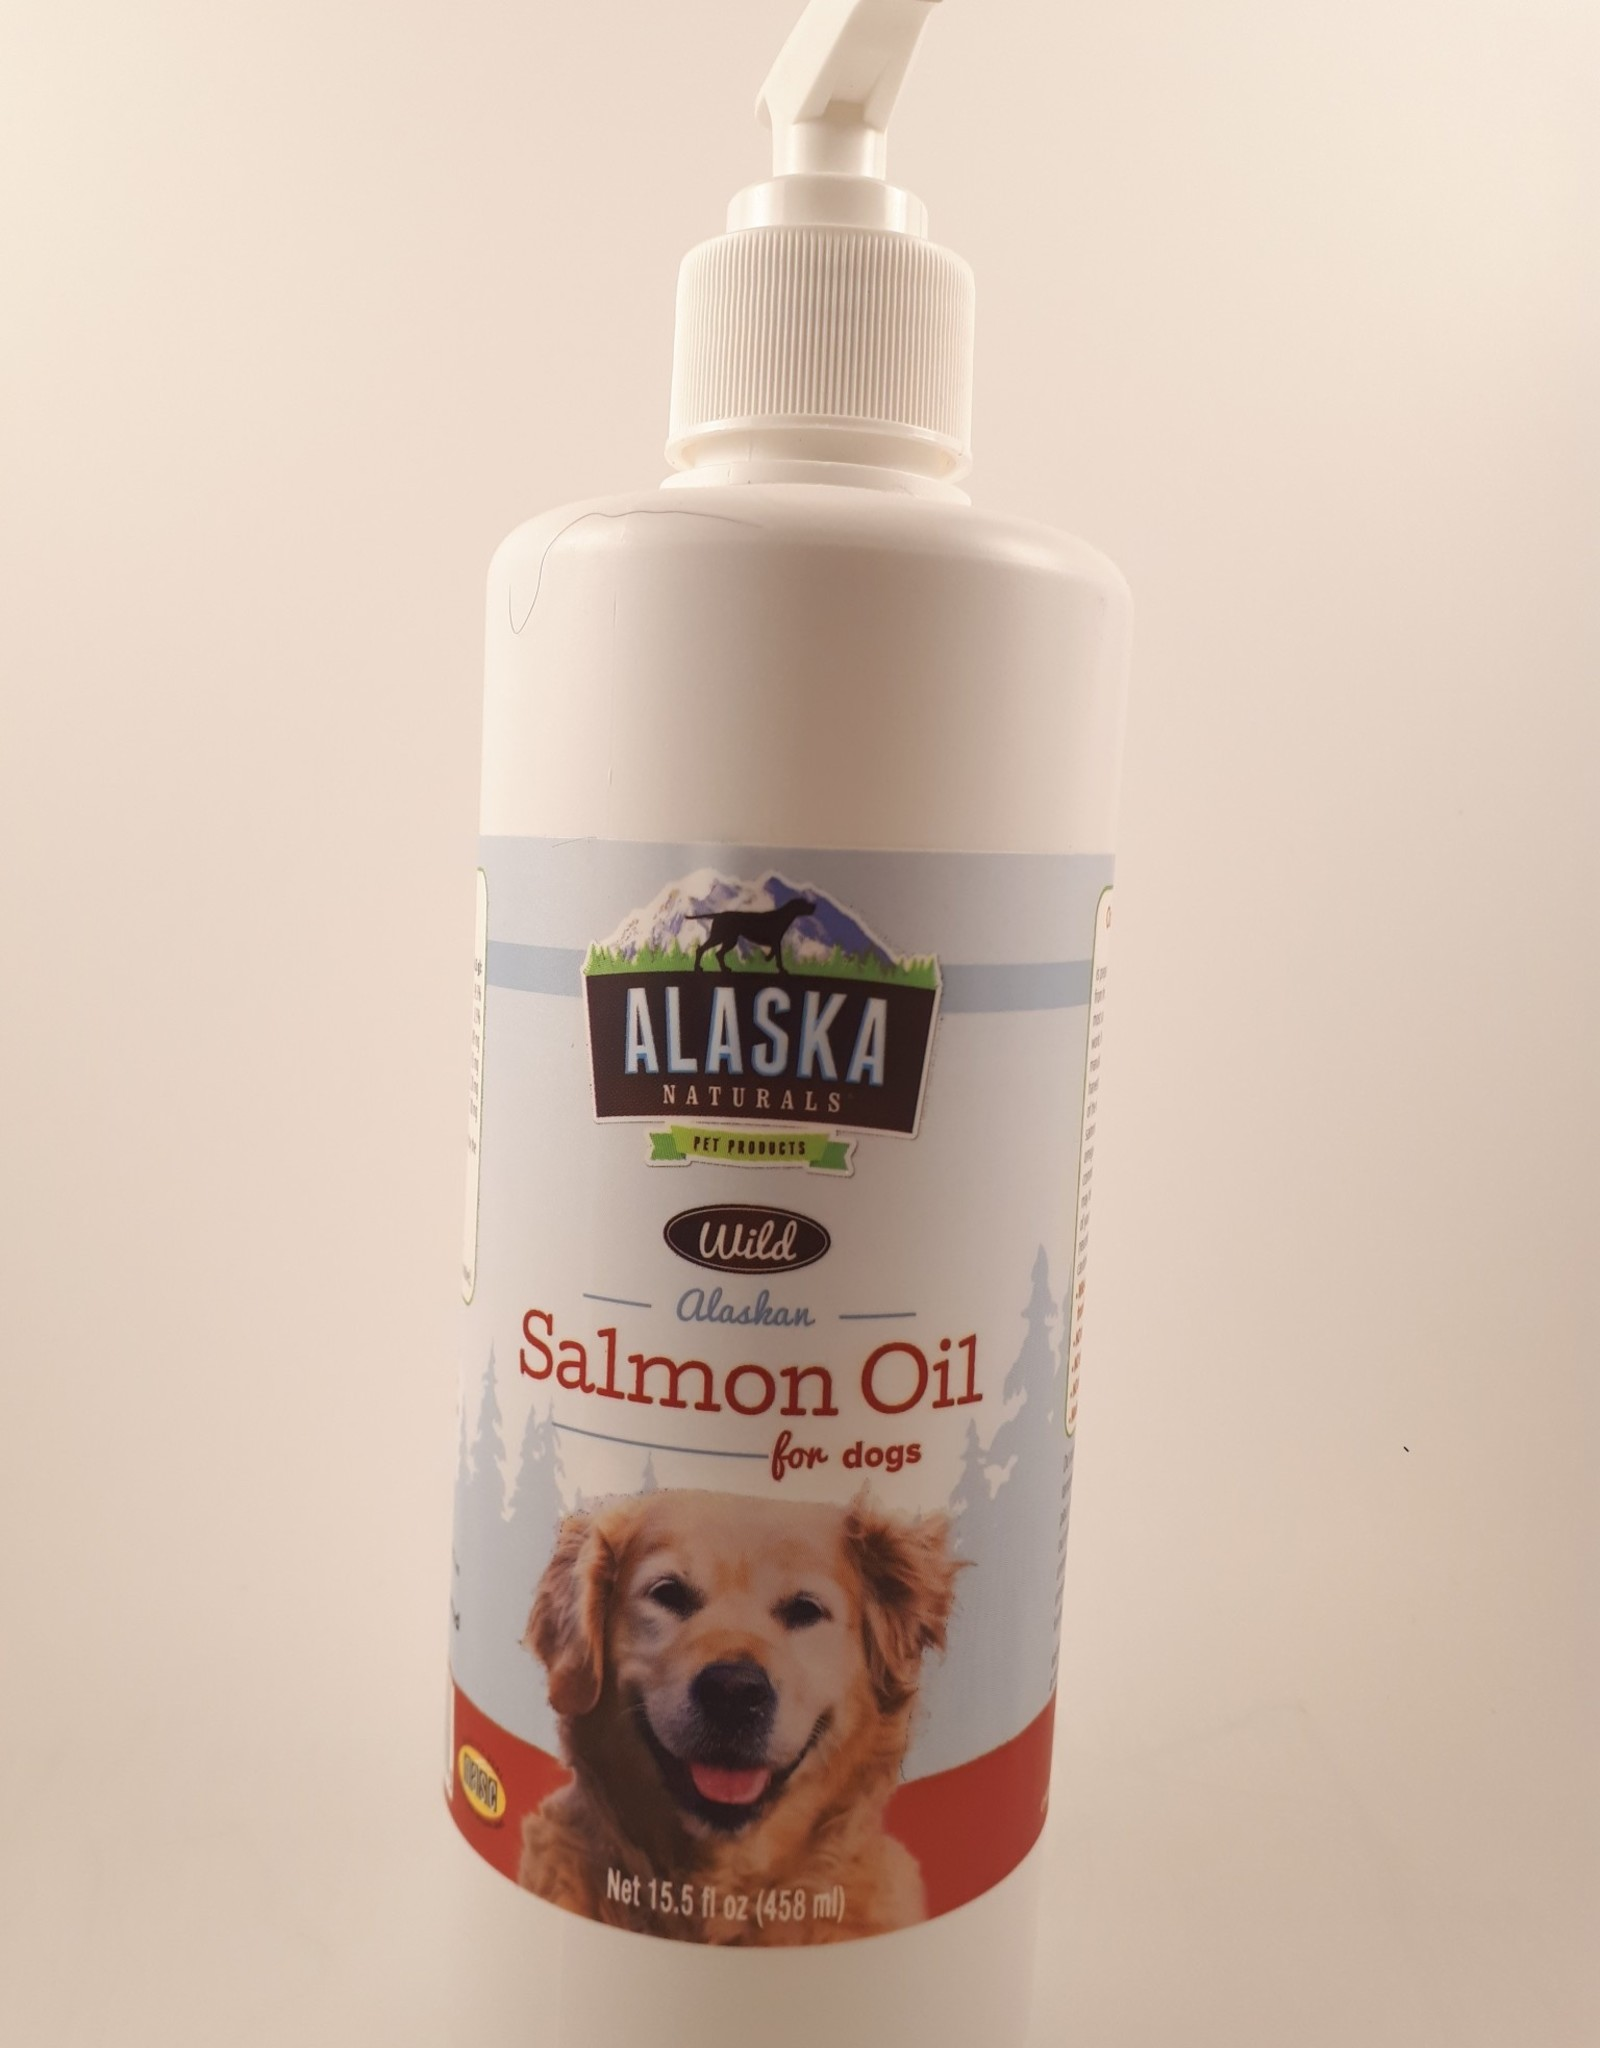 Alaska Naturals Salmon Oil